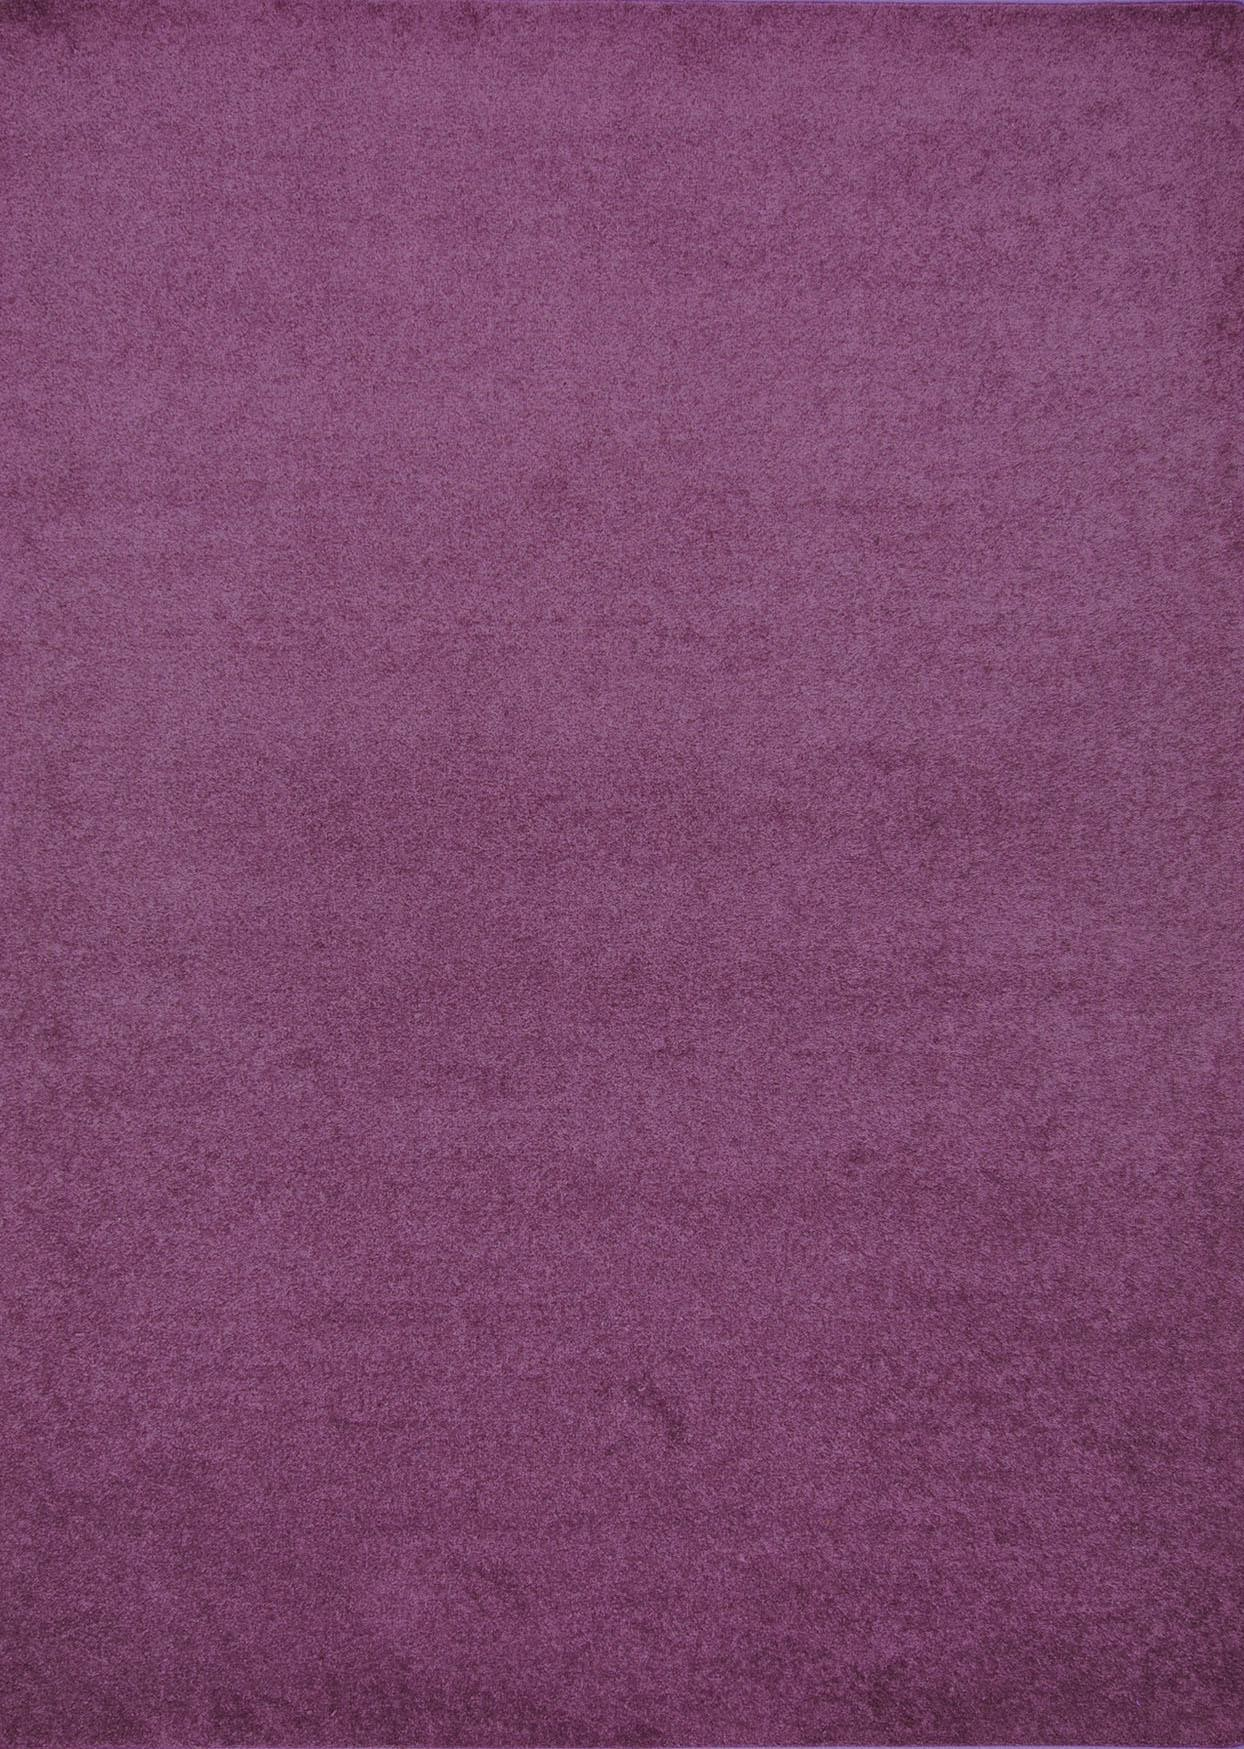 Henley Purple 8 X 10 Solid Rug